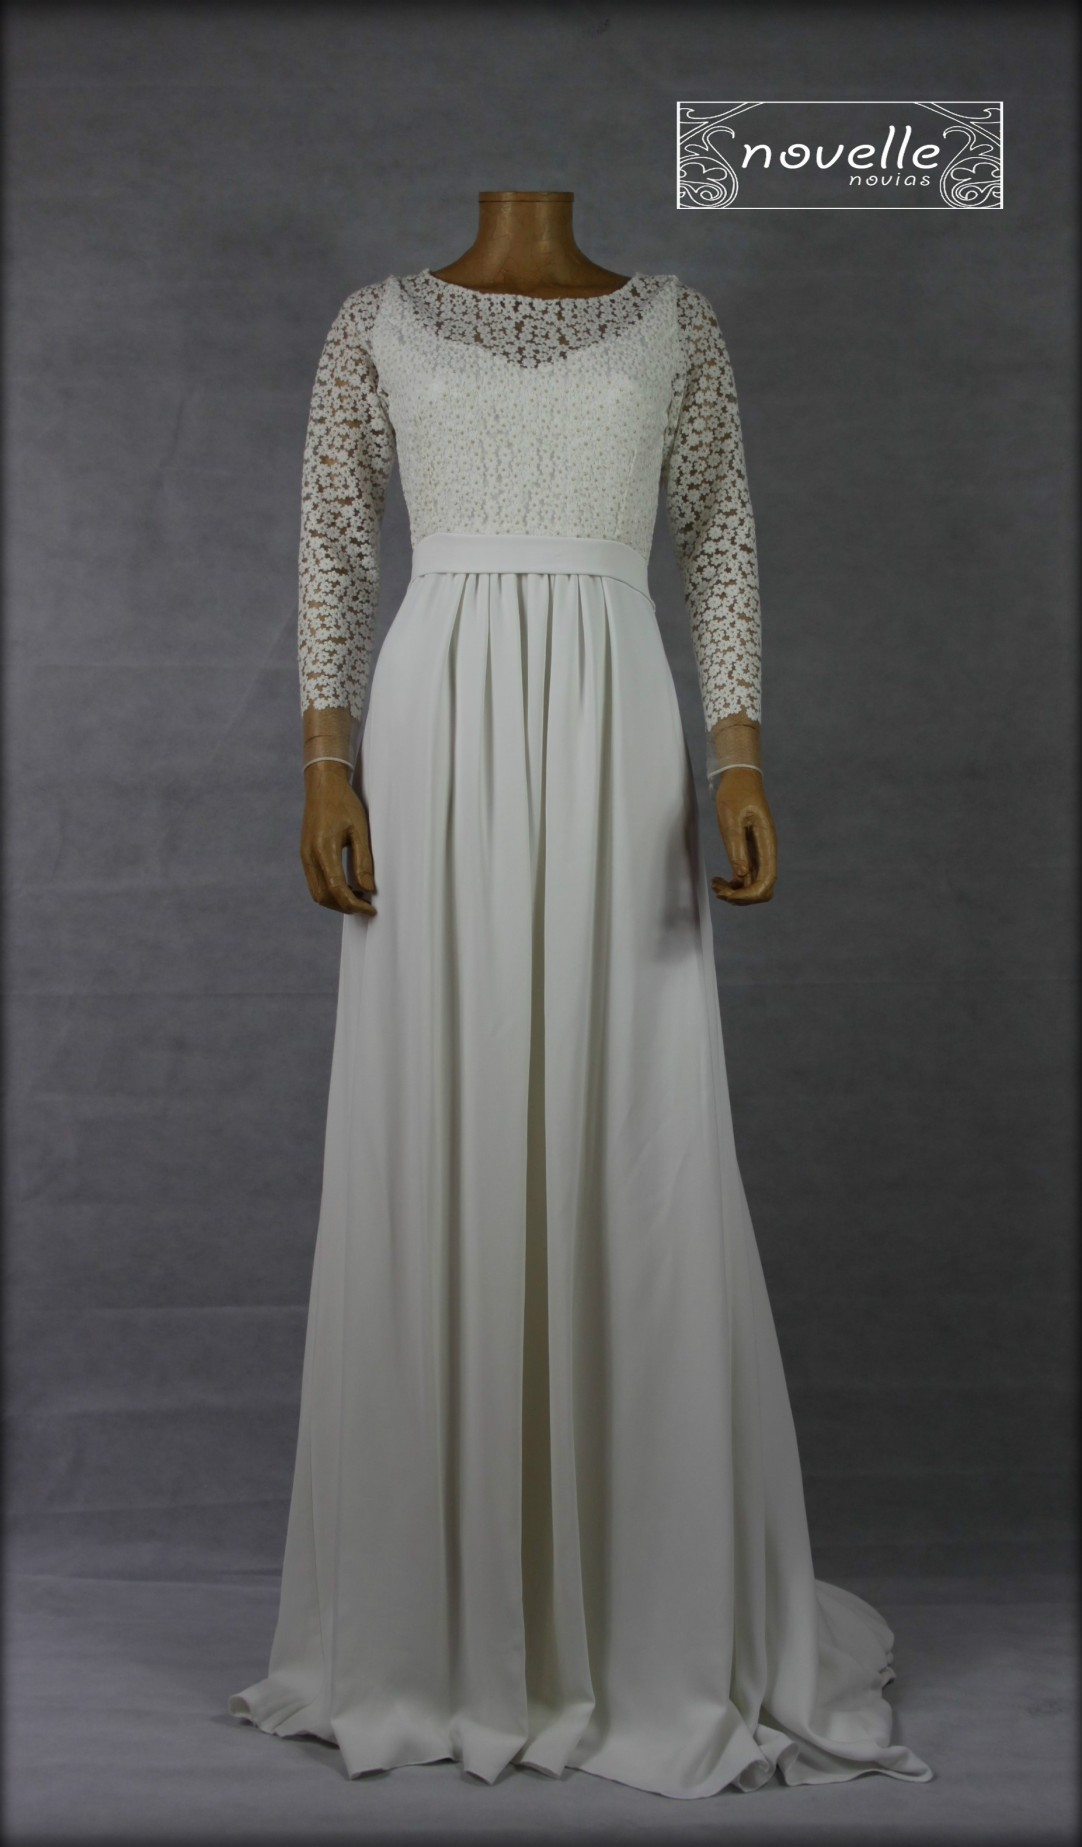 Vestido Dalia - NOVELLE novias